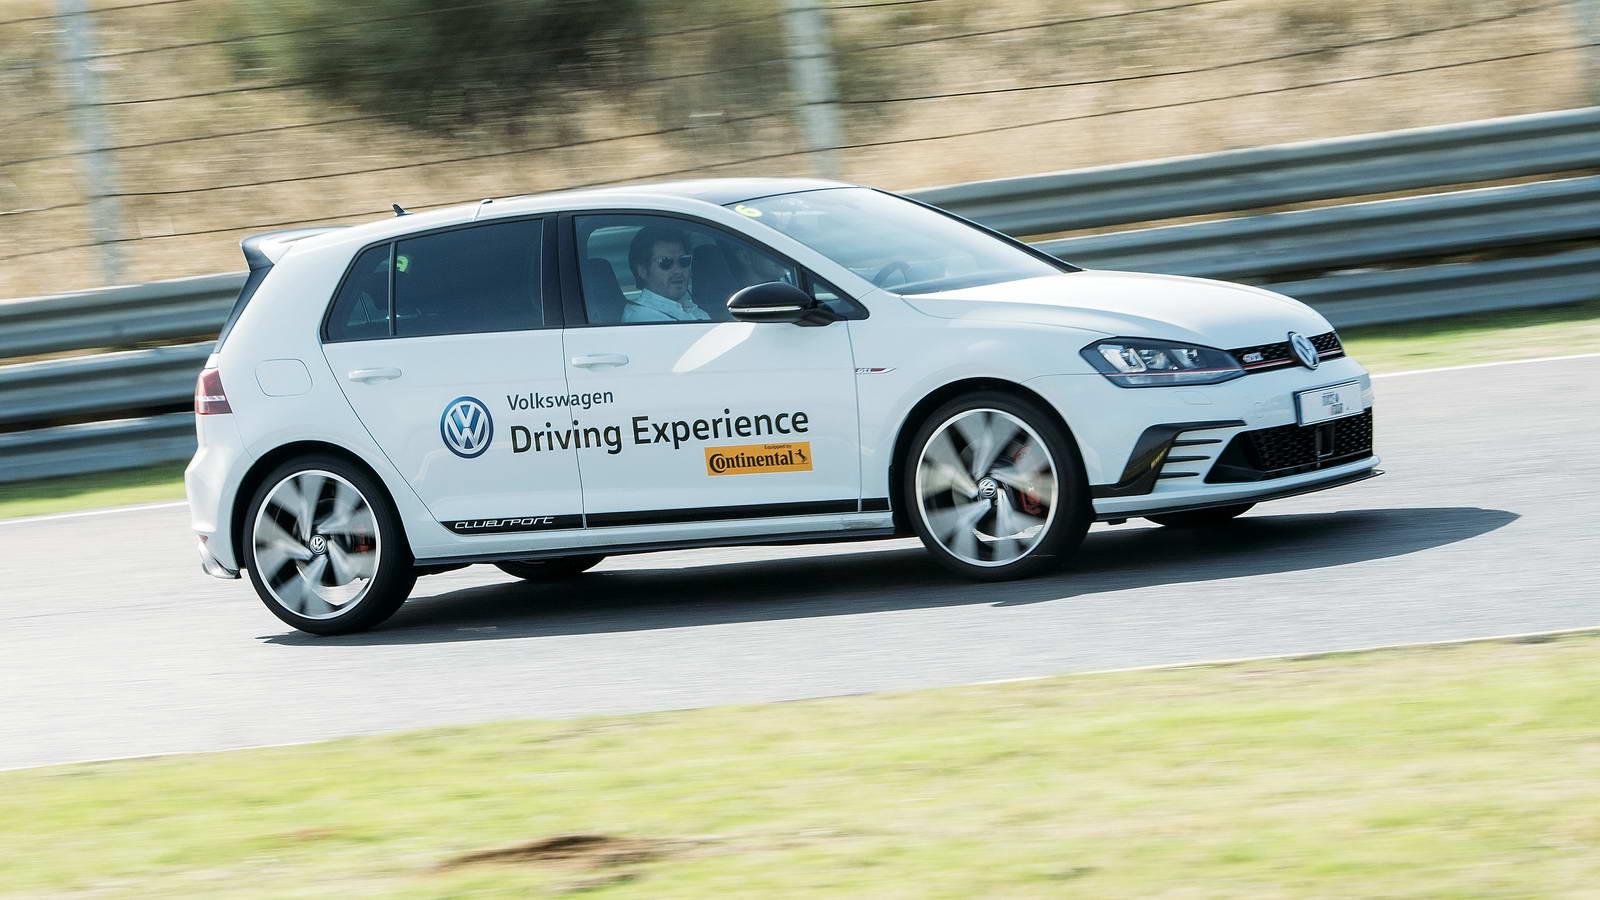 volkswagen_driving_experience_race_tour_jarama_2016_006